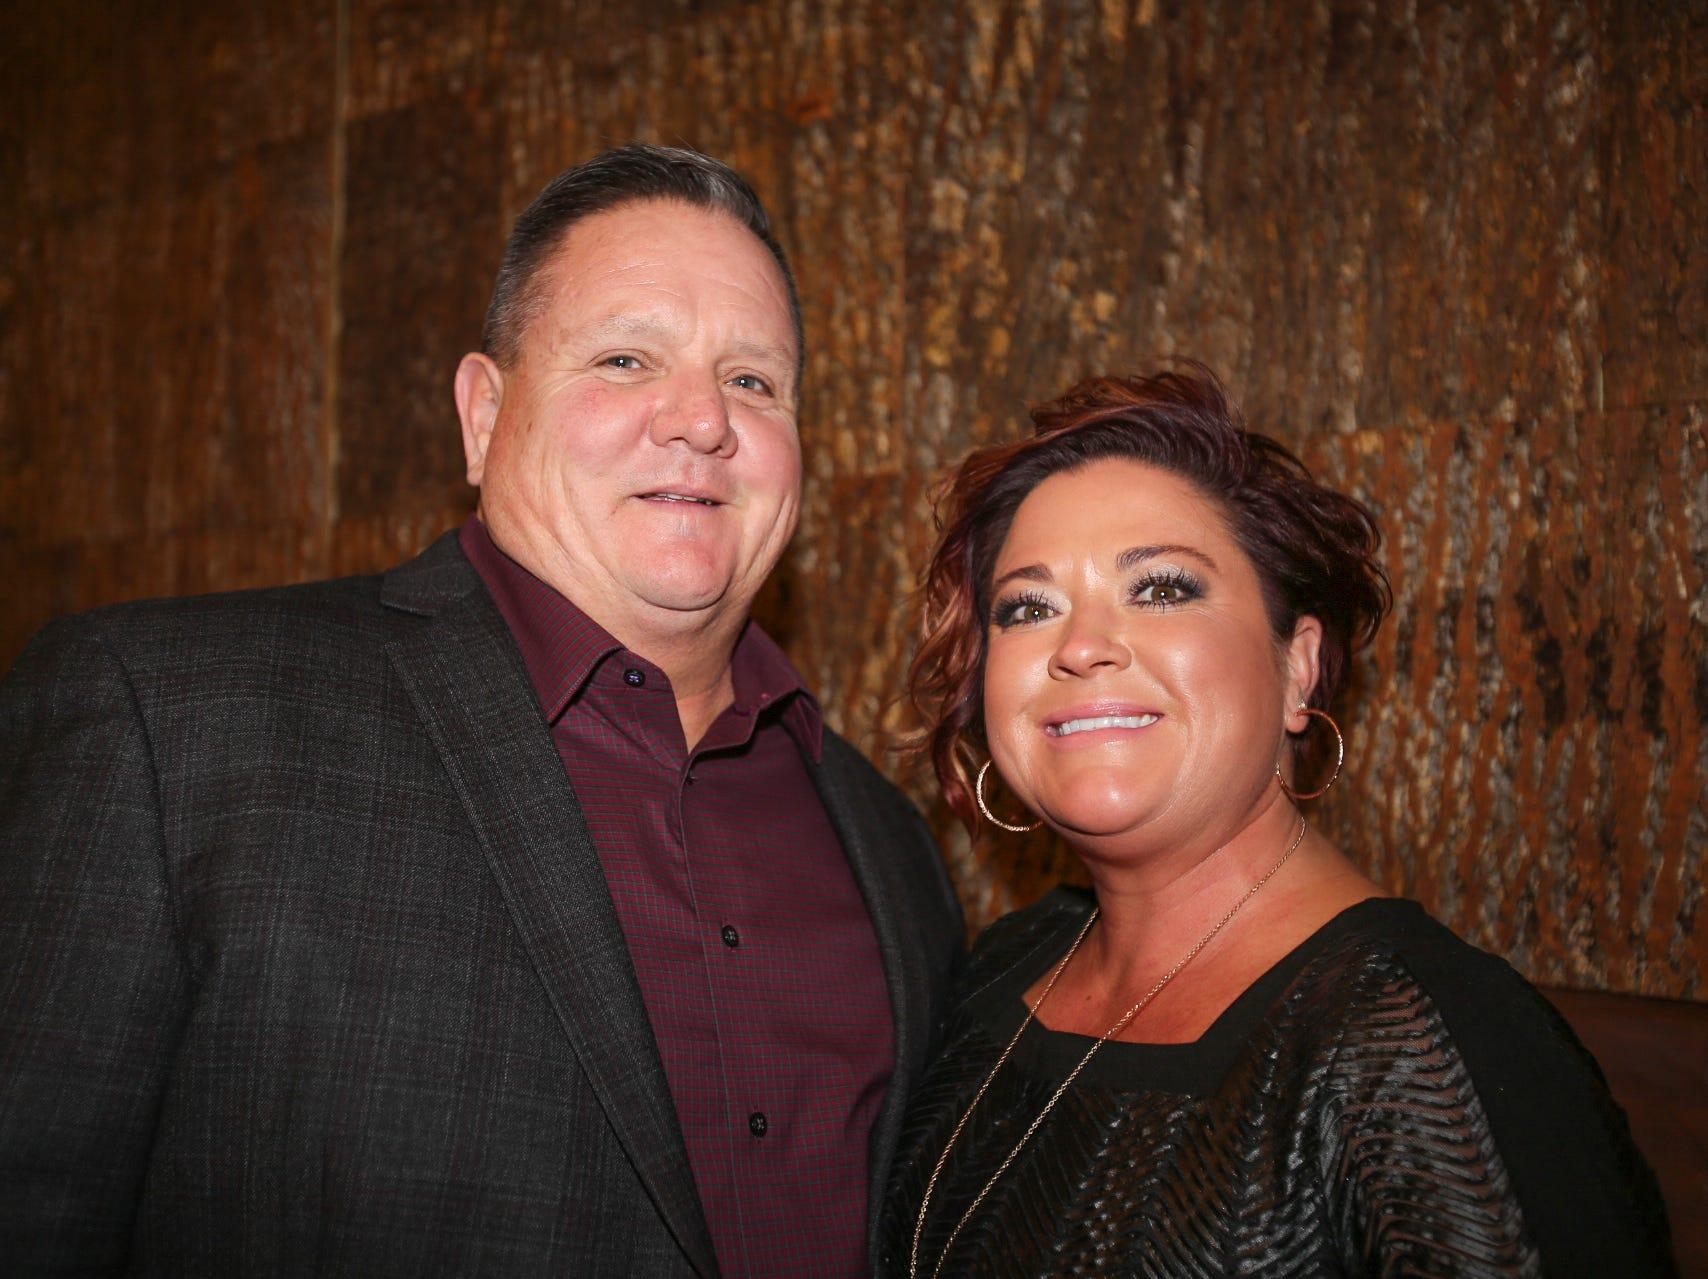 Bob and Holly Hoffman